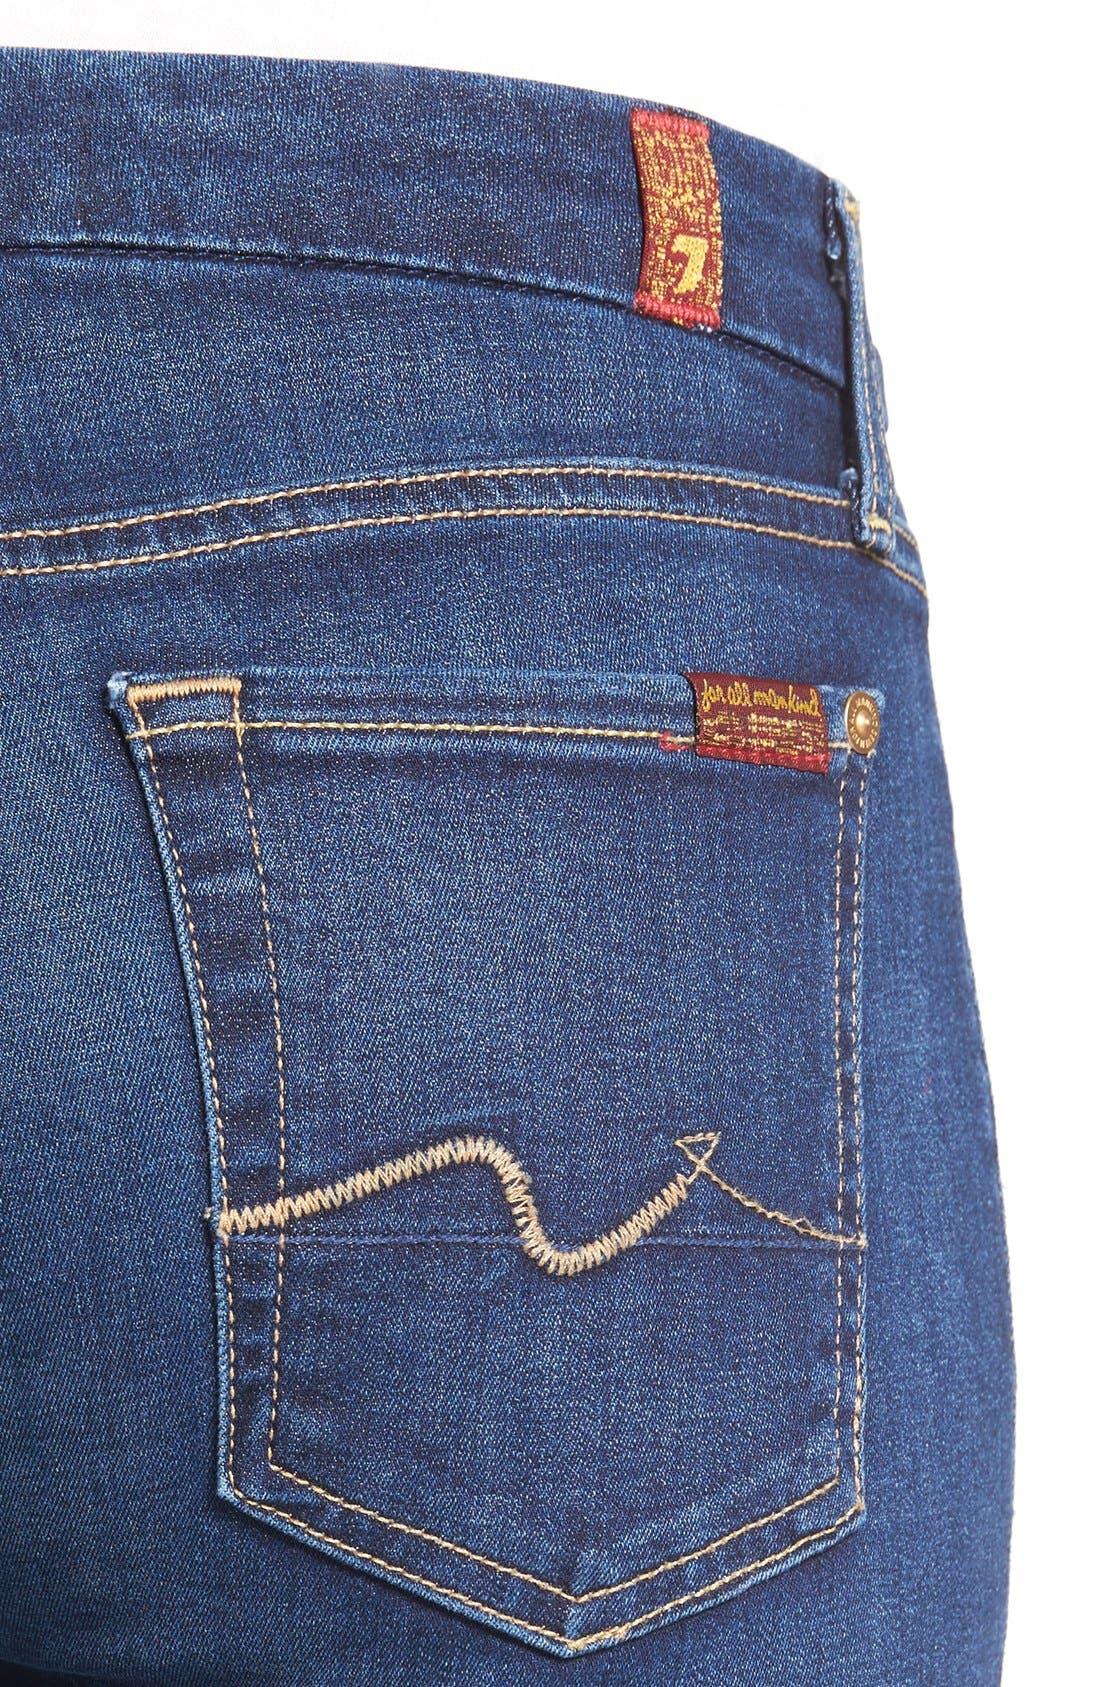 b(air) Skinny Jeans,                             Alternate thumbnail 7, color,                             400